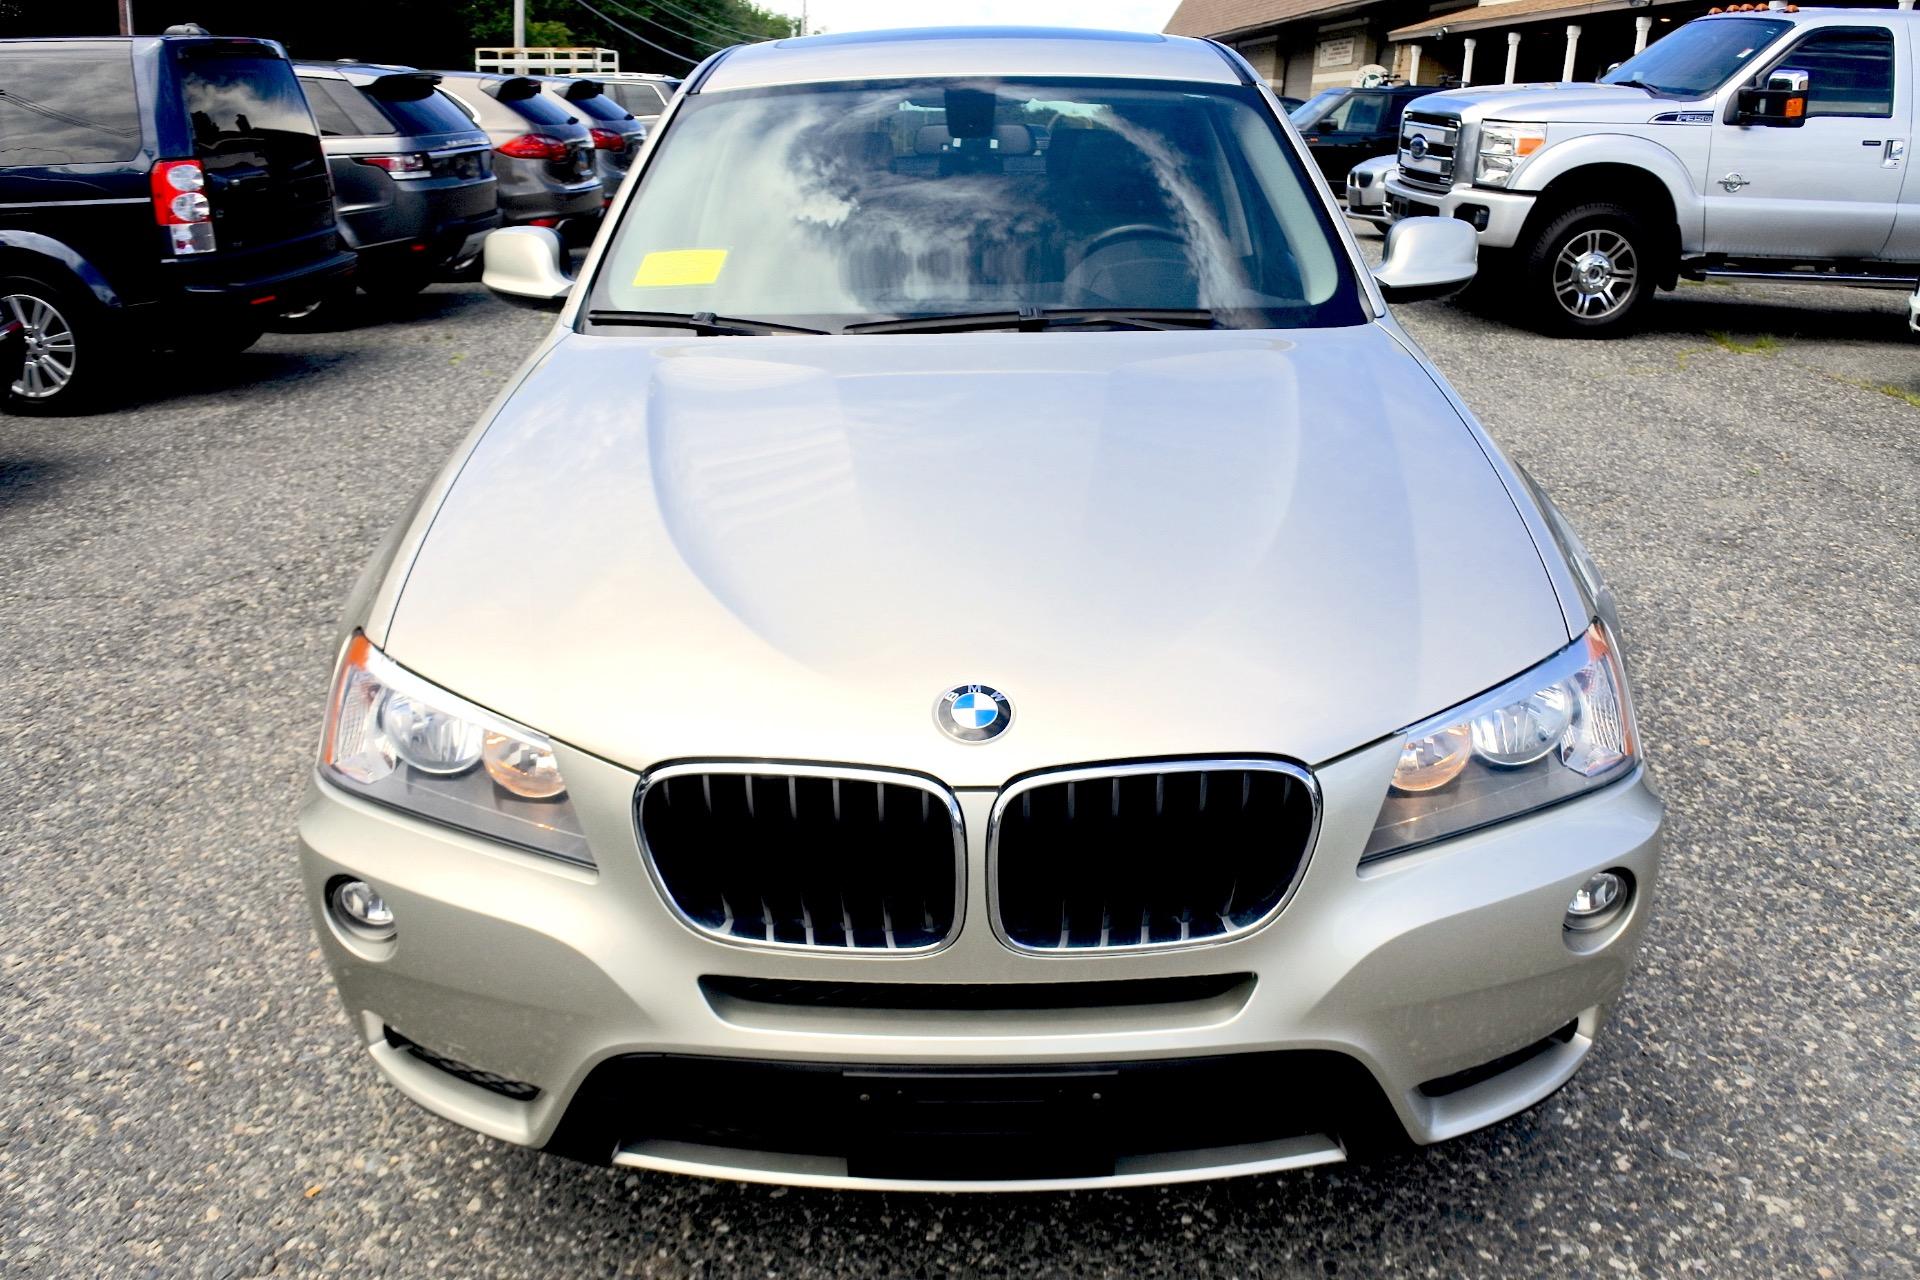 Used 2013 BMW X3 AWD 4dr xDrive28i Used 2013 BMW X3 AWD 4dr xDrive28i for sale  at Metro West Motorcars LLC in Shrewsbury MA 8